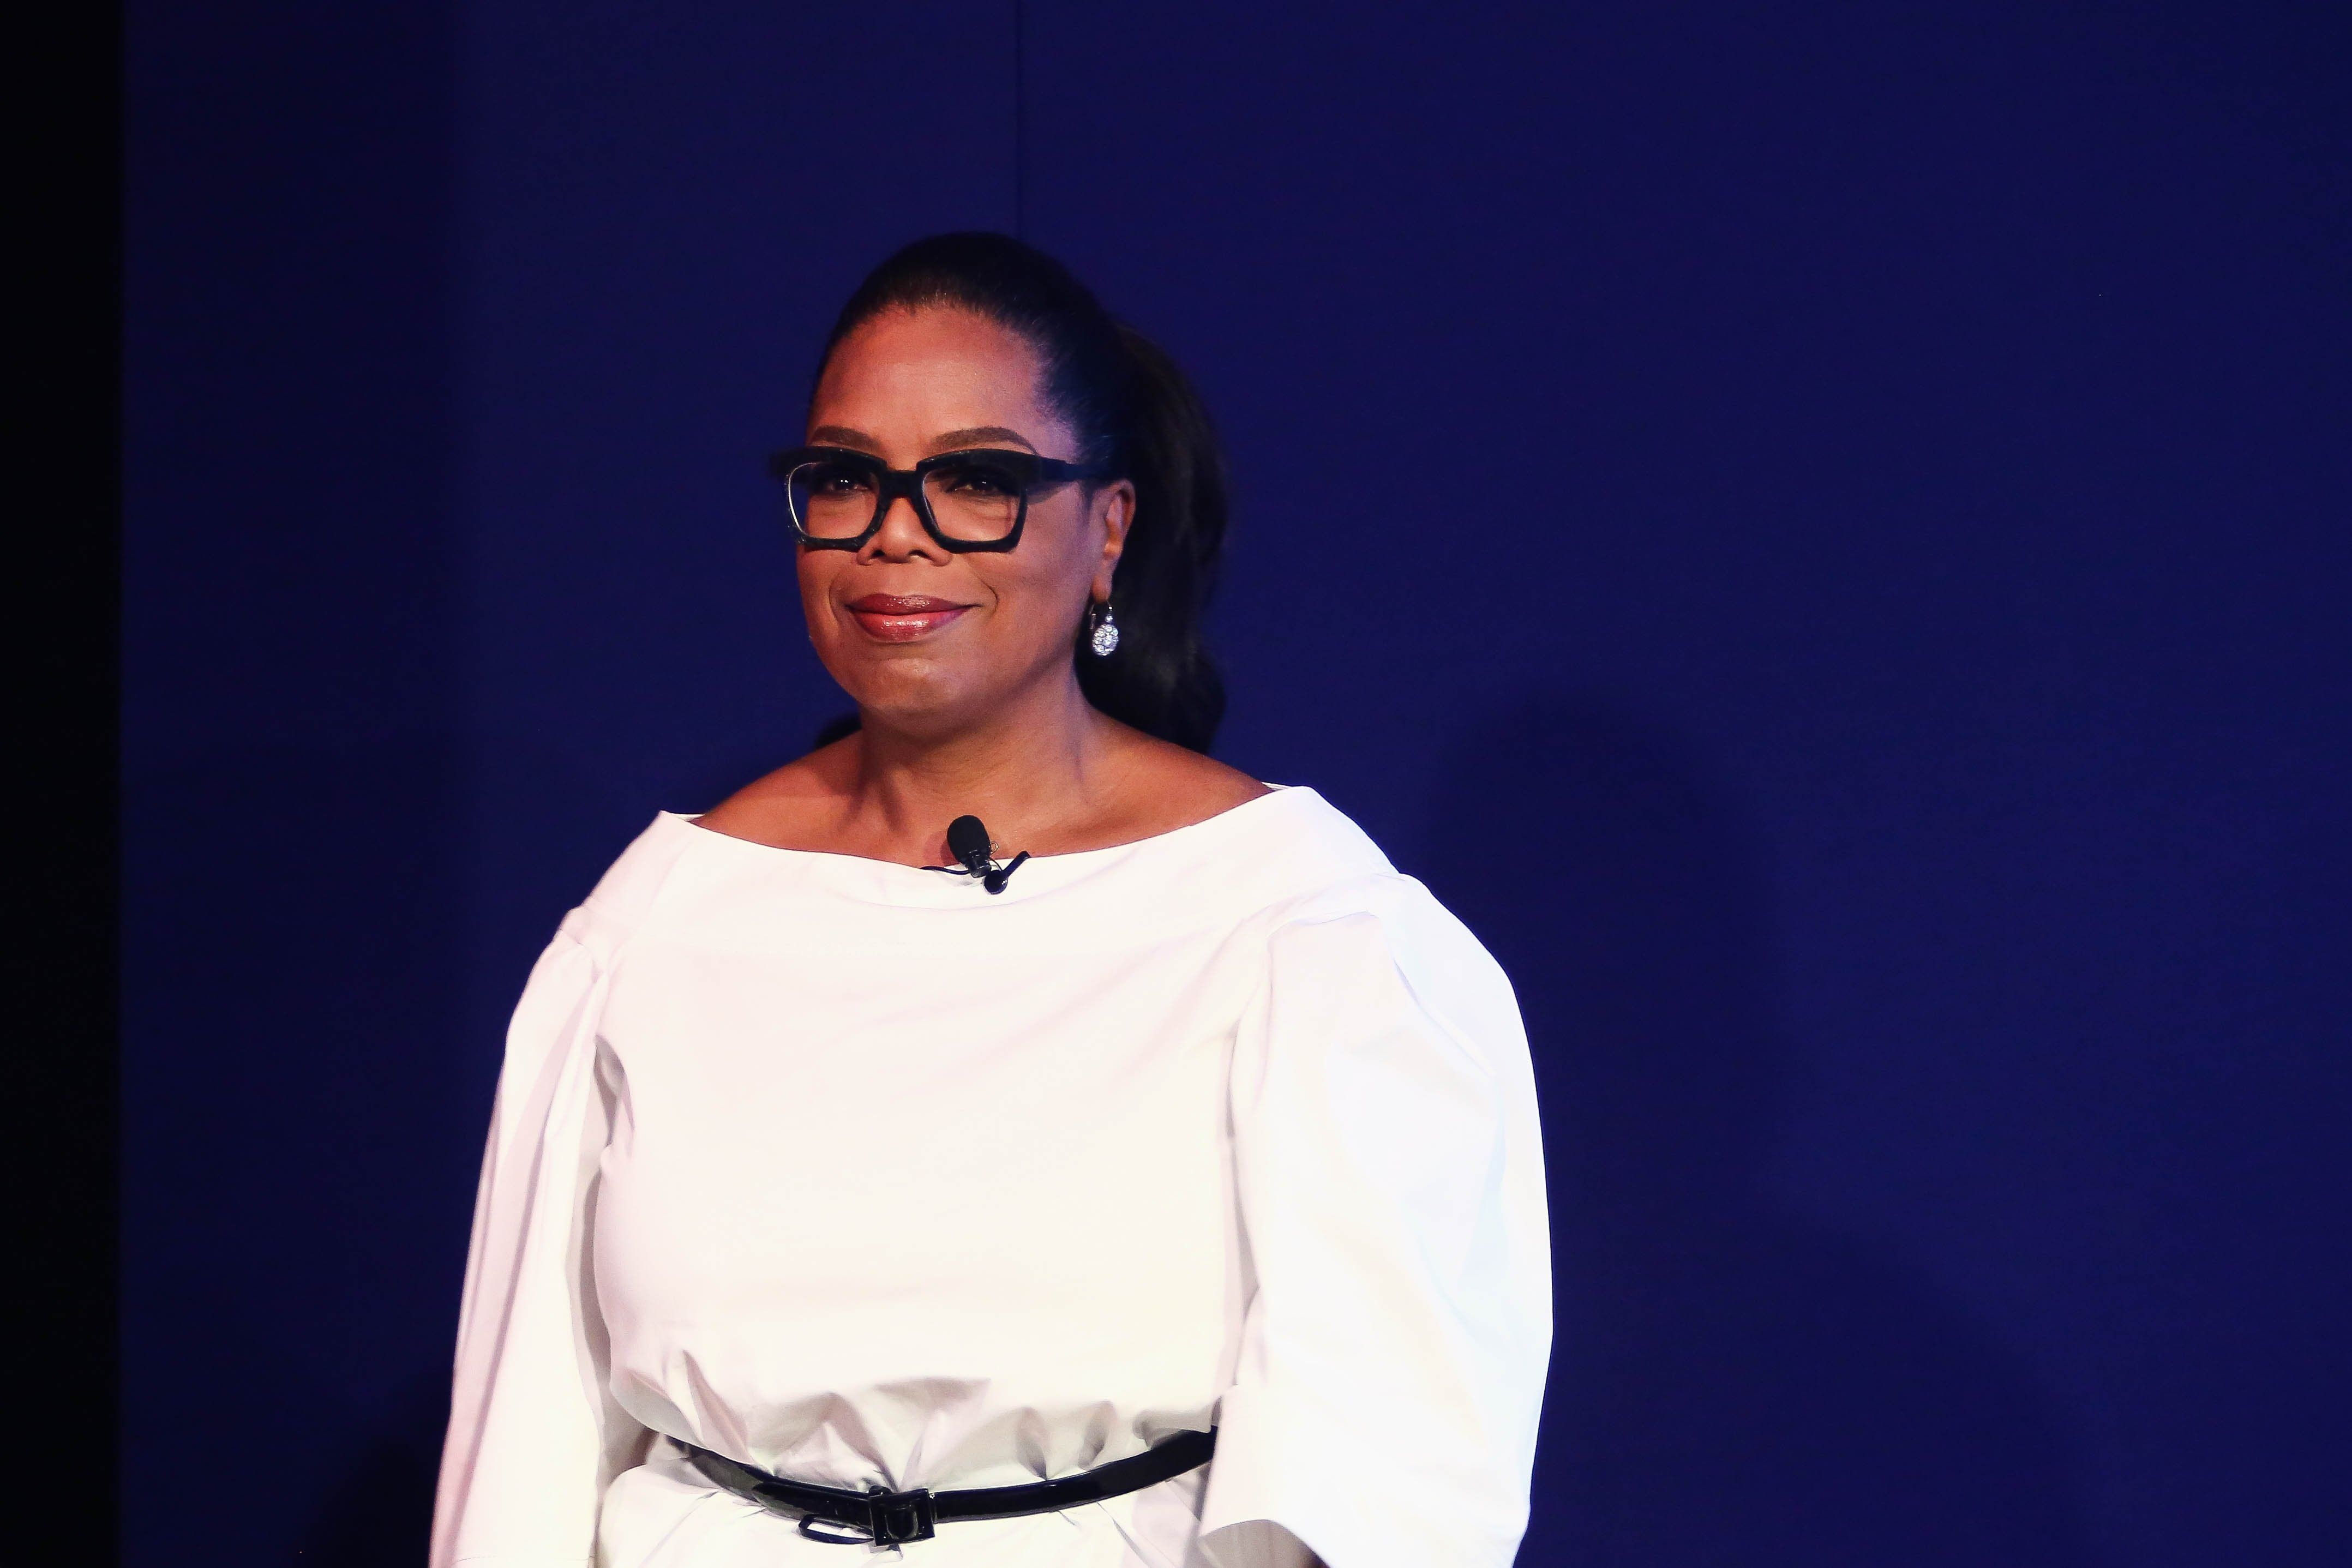 Oprah Winfrey Reveals How Weight Struggle 'Kept Her From Doing